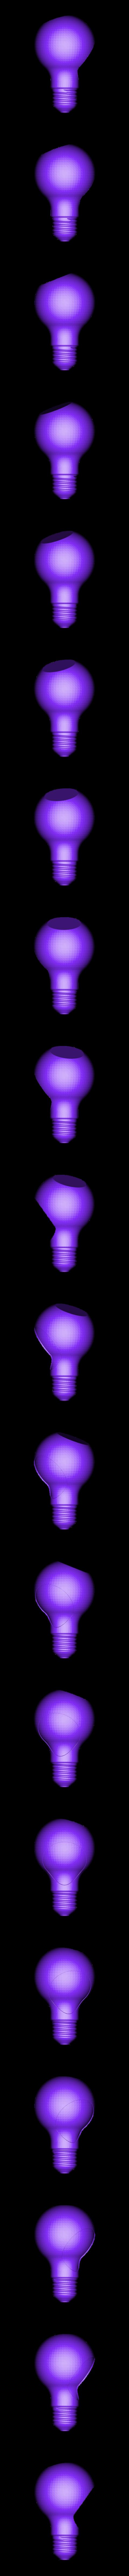 JX bulb.STL Download STL file Bulb Pot • 3D printable design, Dekro